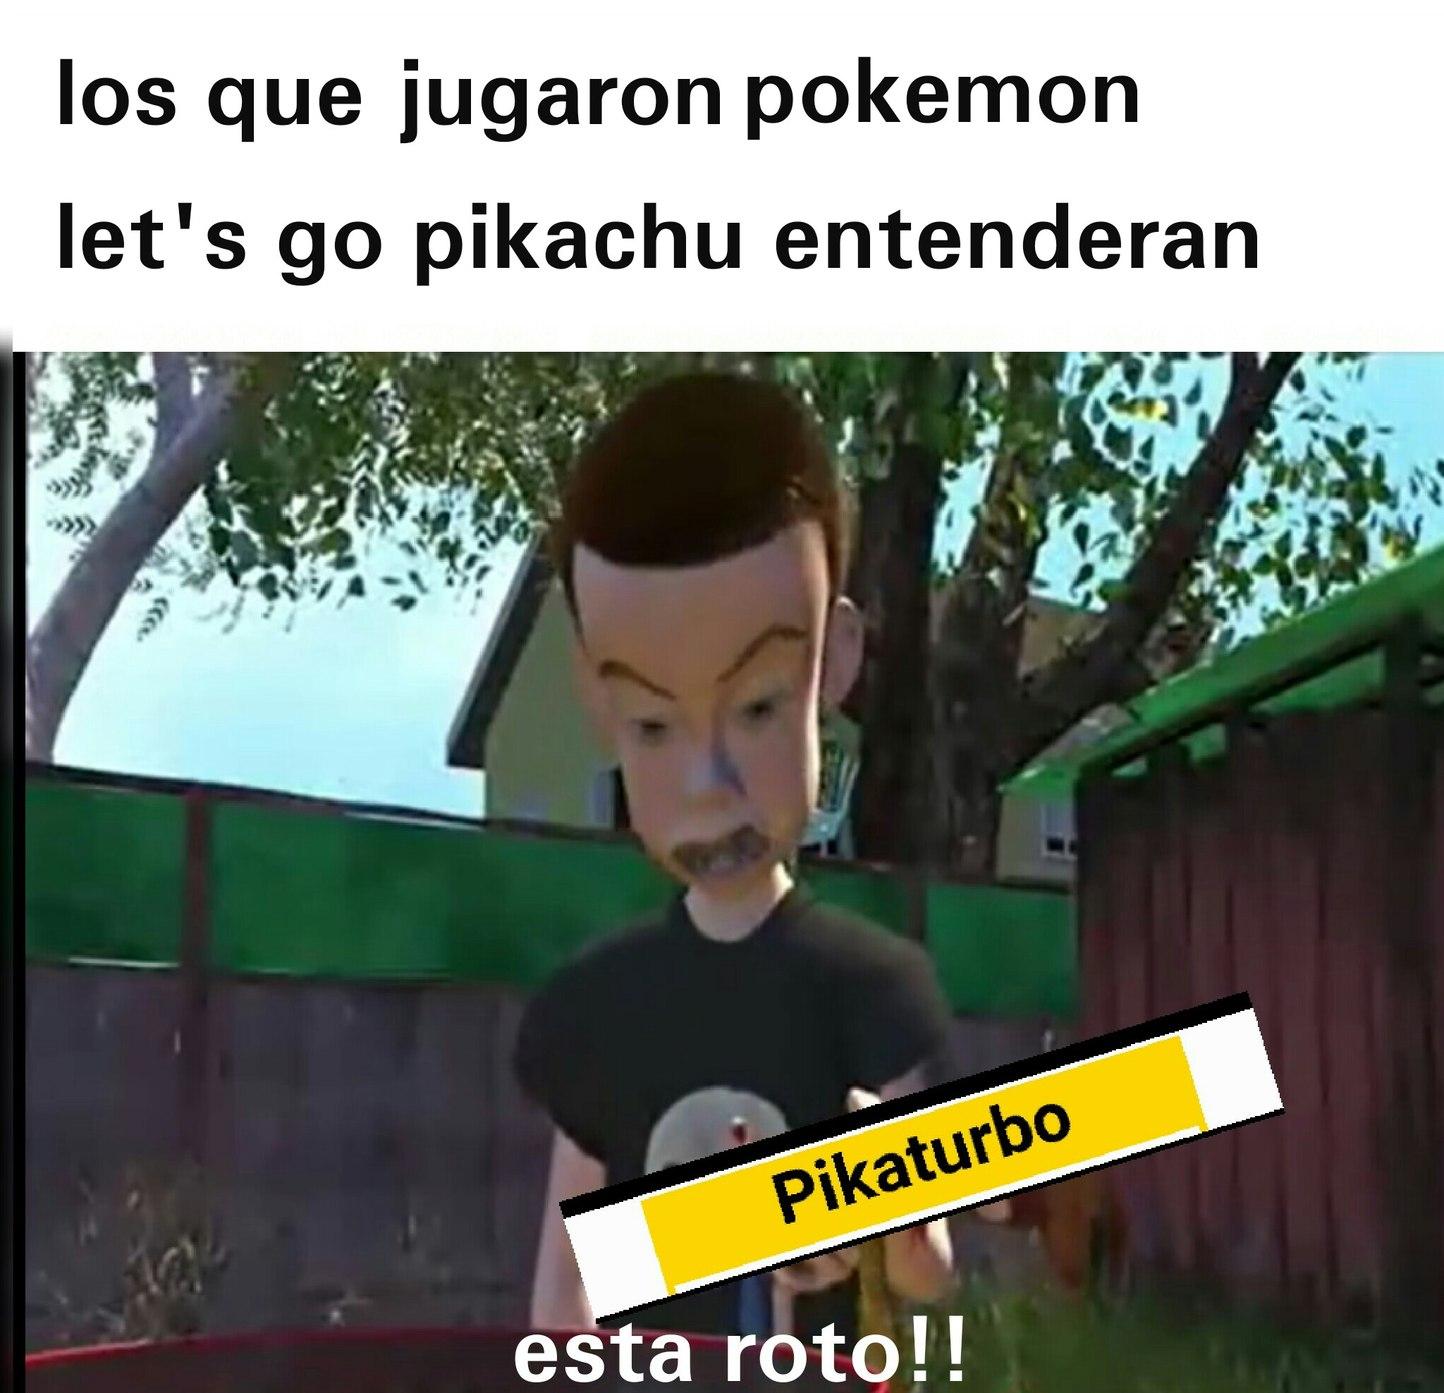 O los españoles... - meme